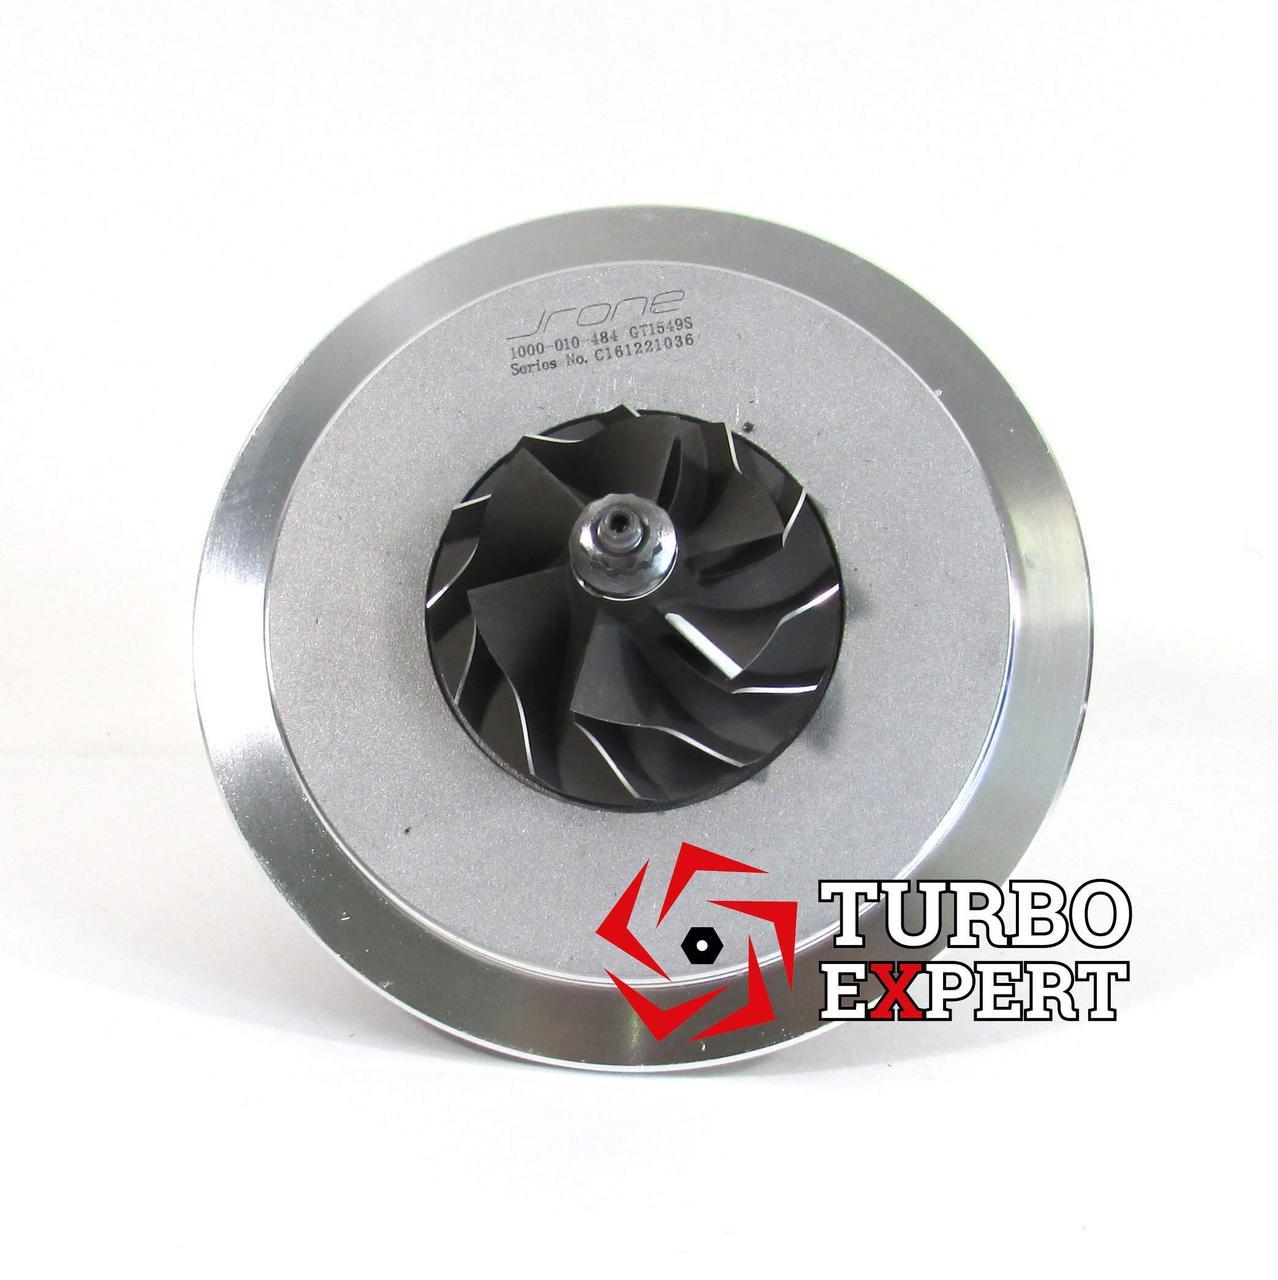 Картридж турбины 701072-0001, 701072-1, Citroen Evasion 2.1 TD, 80 Kw, XUD11BTE, 0375A4, 1998+